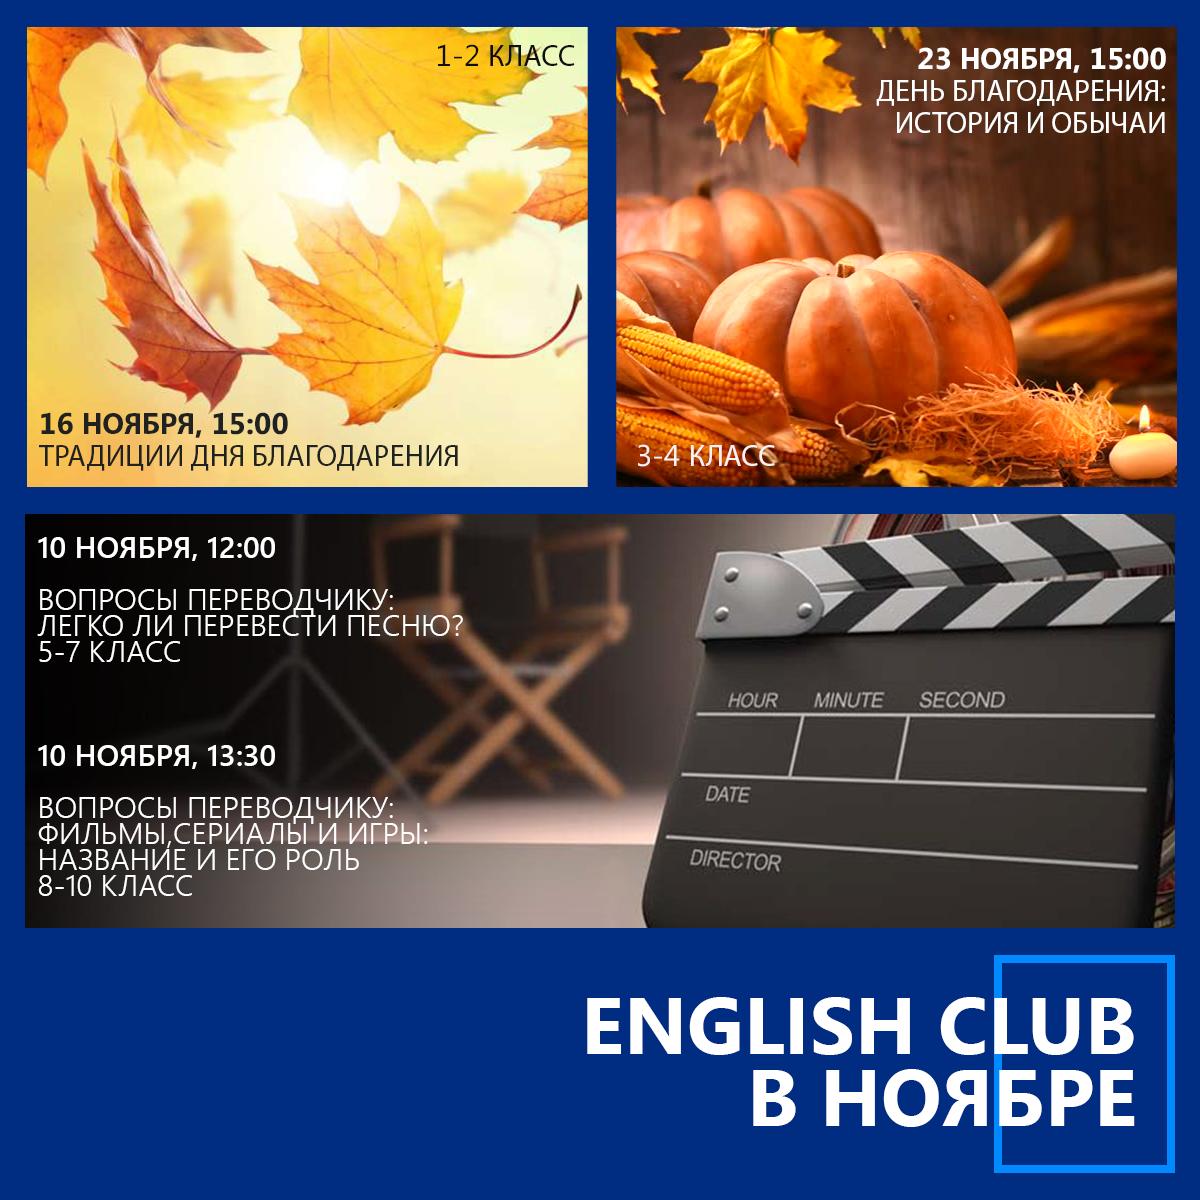 English Club в ноябре